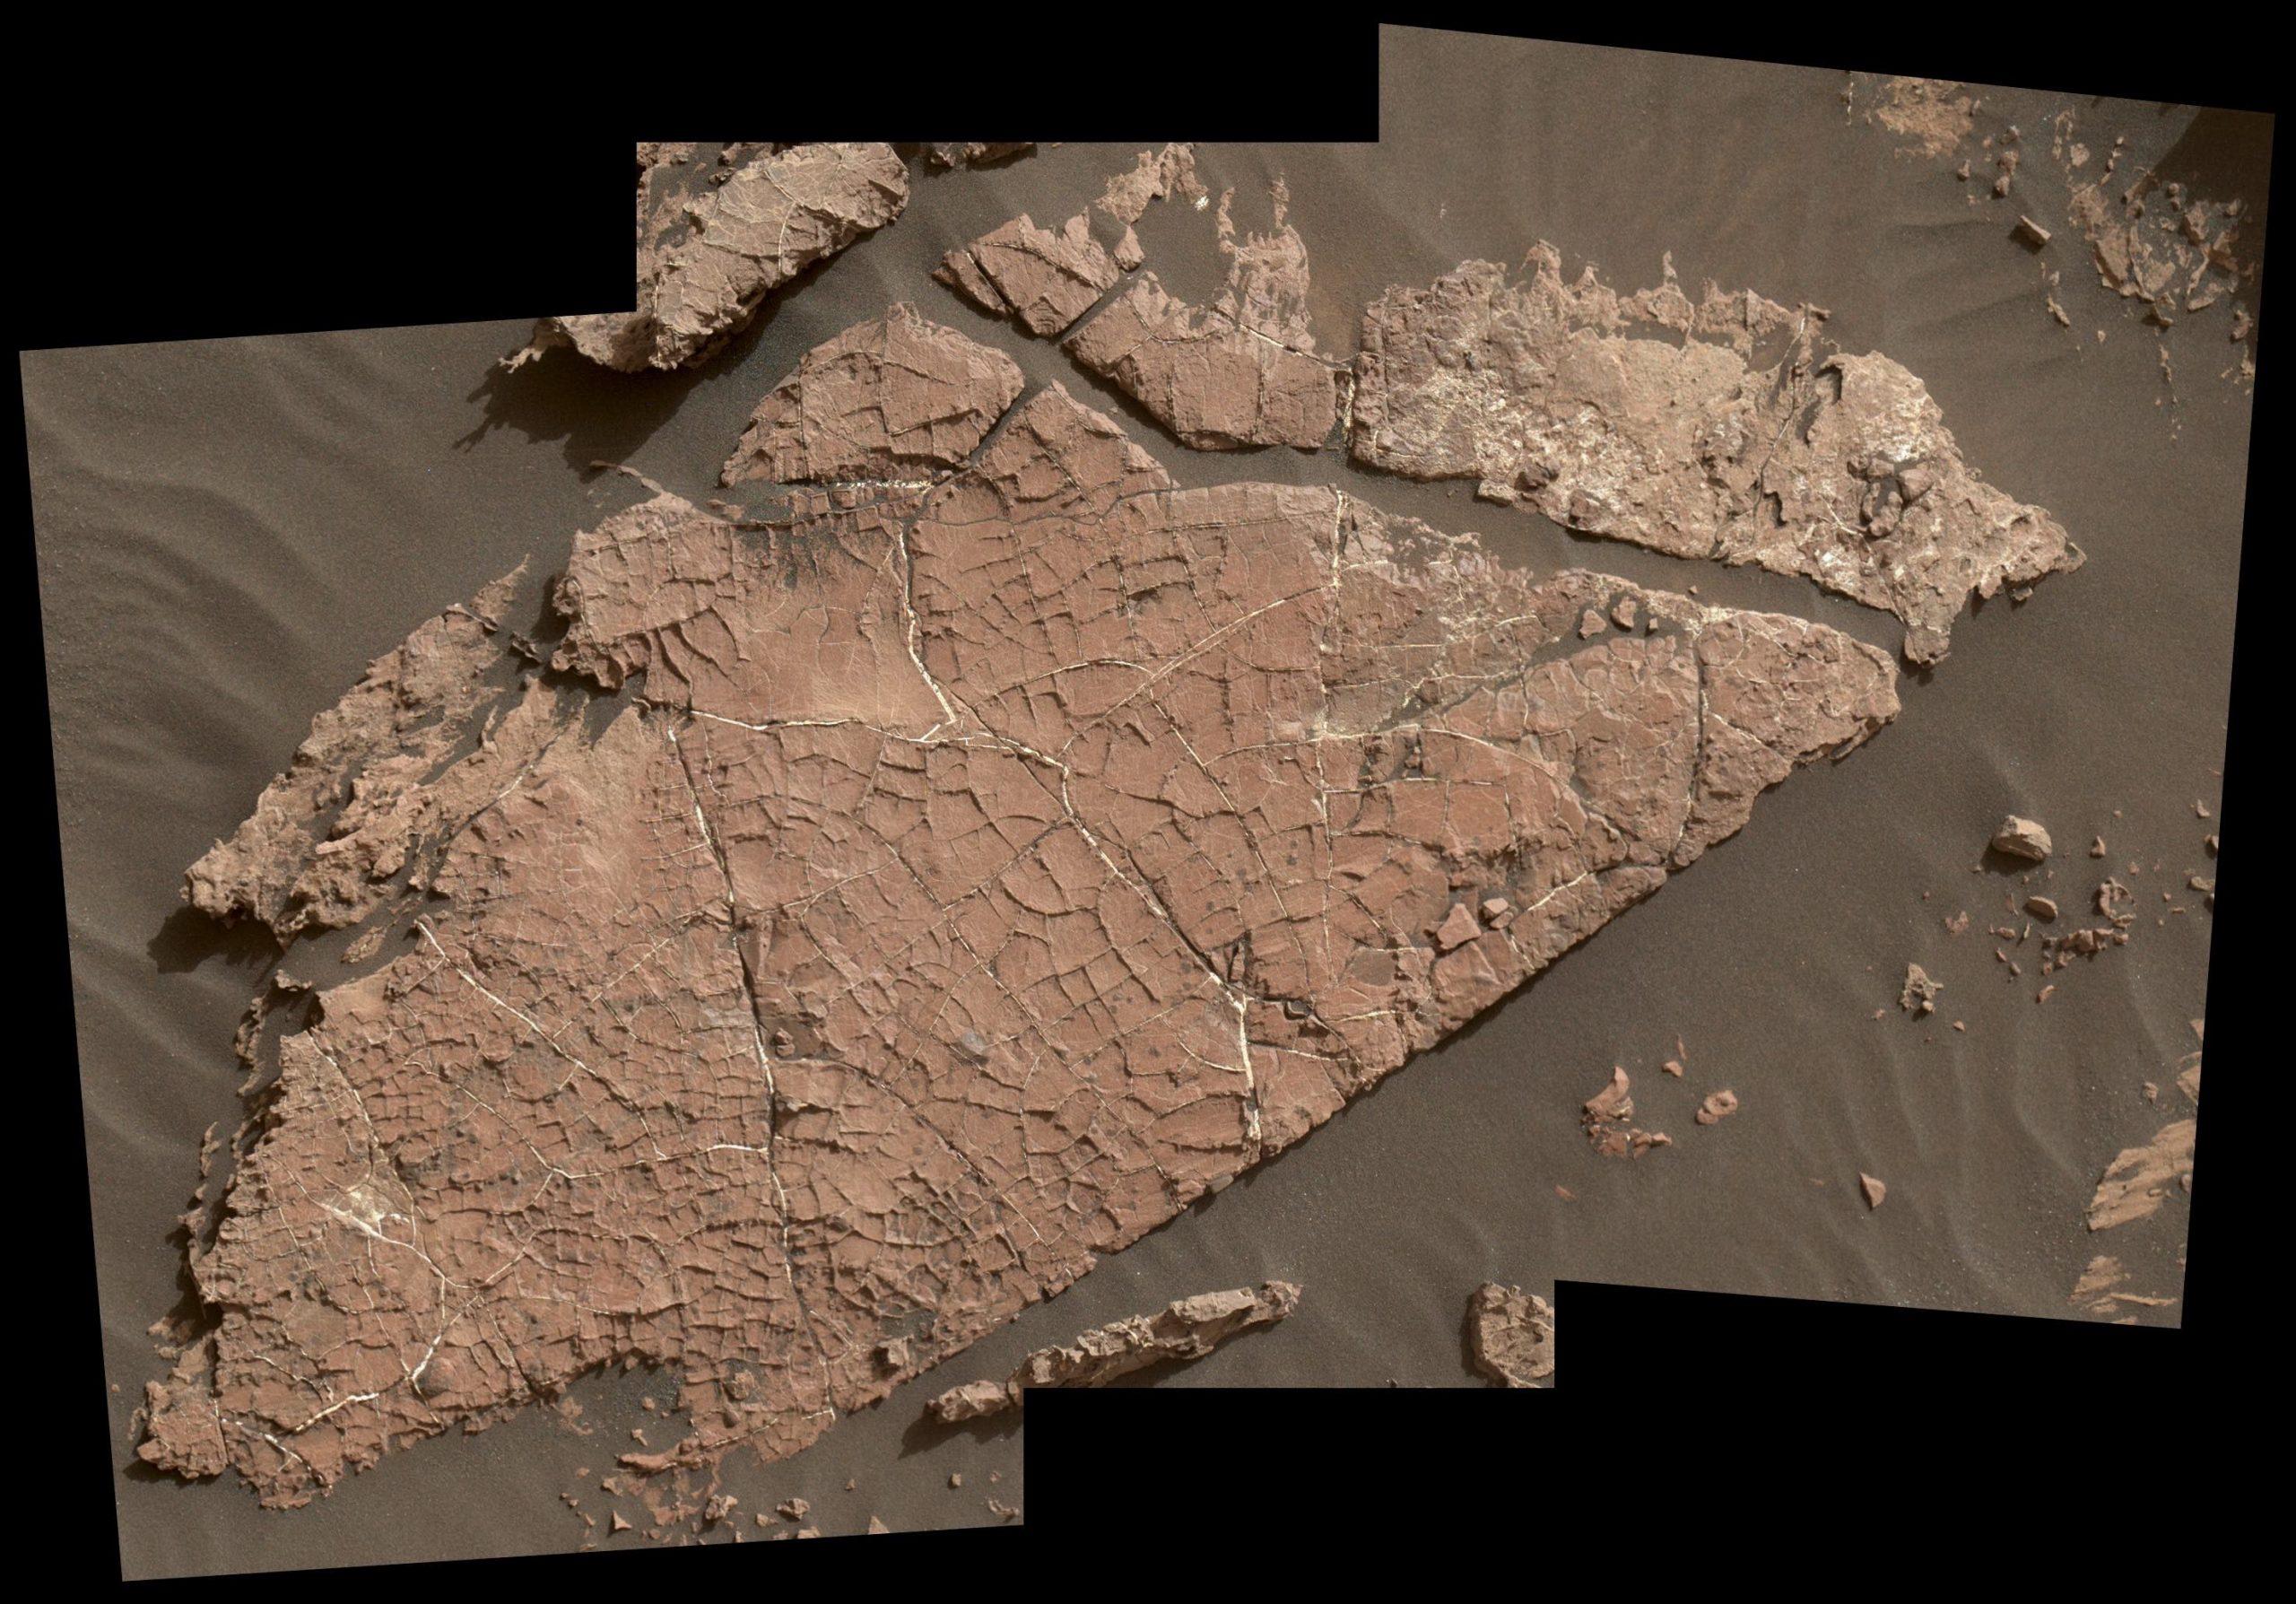 Composite photos of mudcracks seen in Gale Crater, Mars.